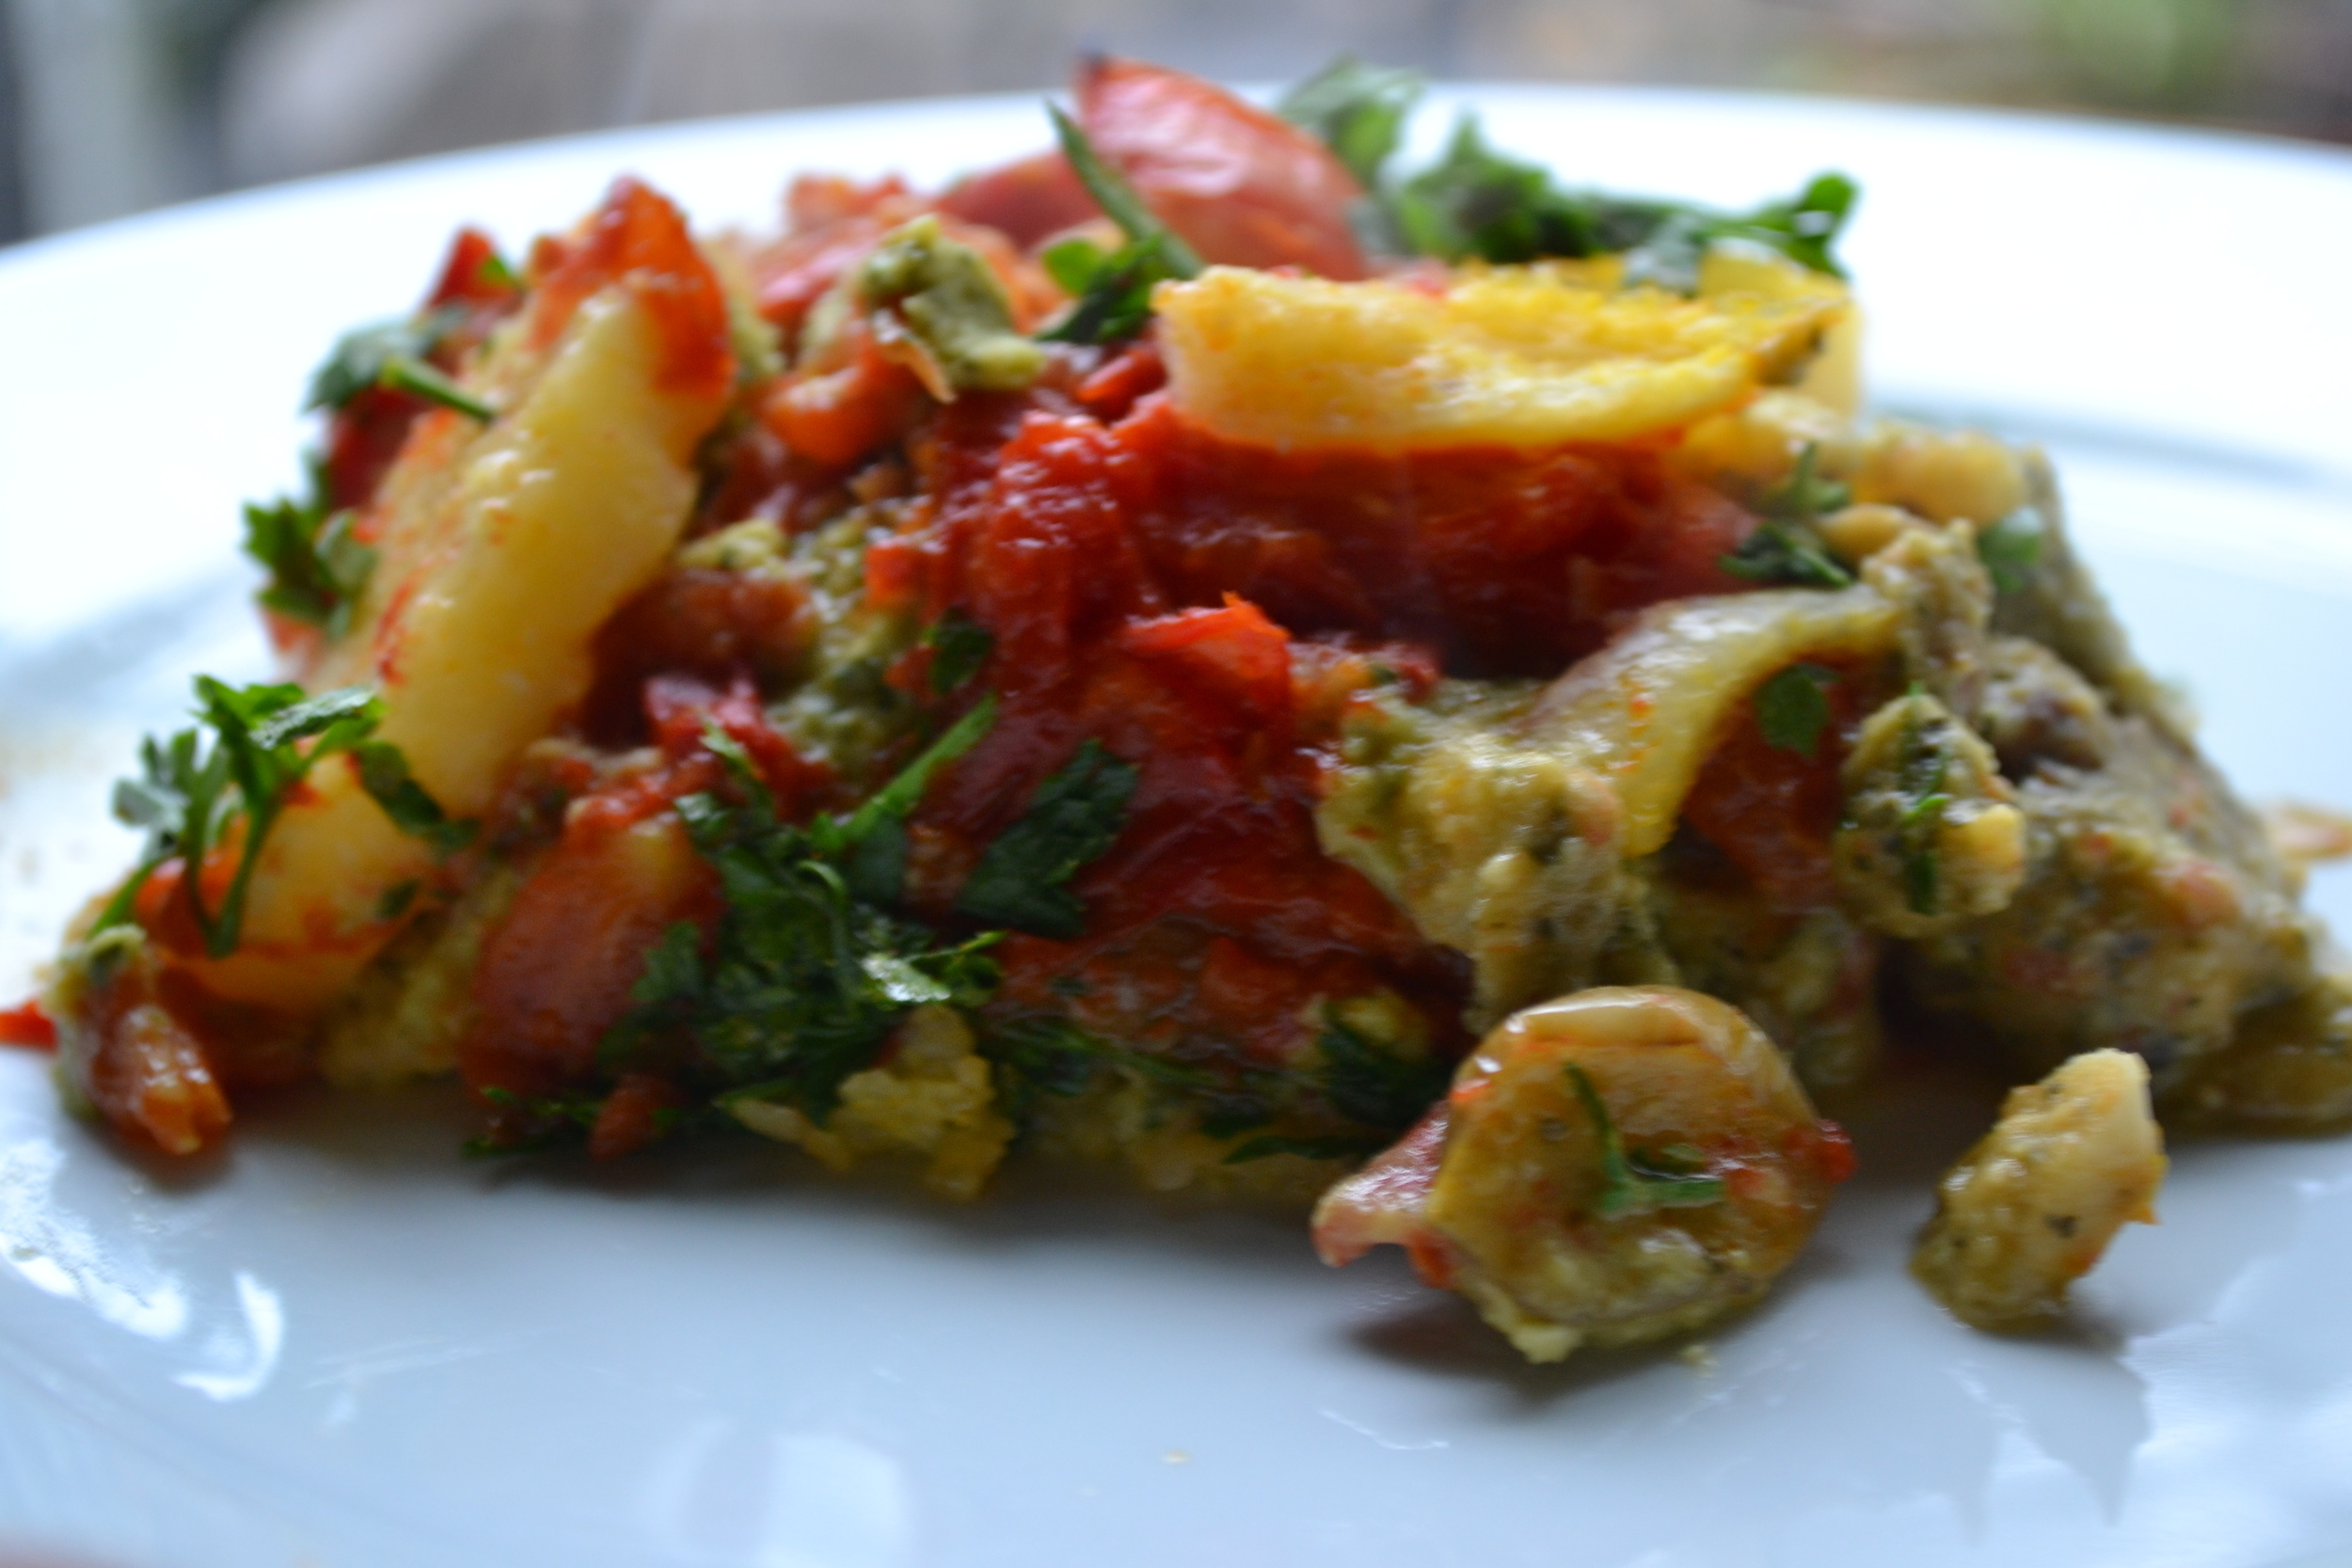 Vegan polenta lasagna with ricNOTta cheese